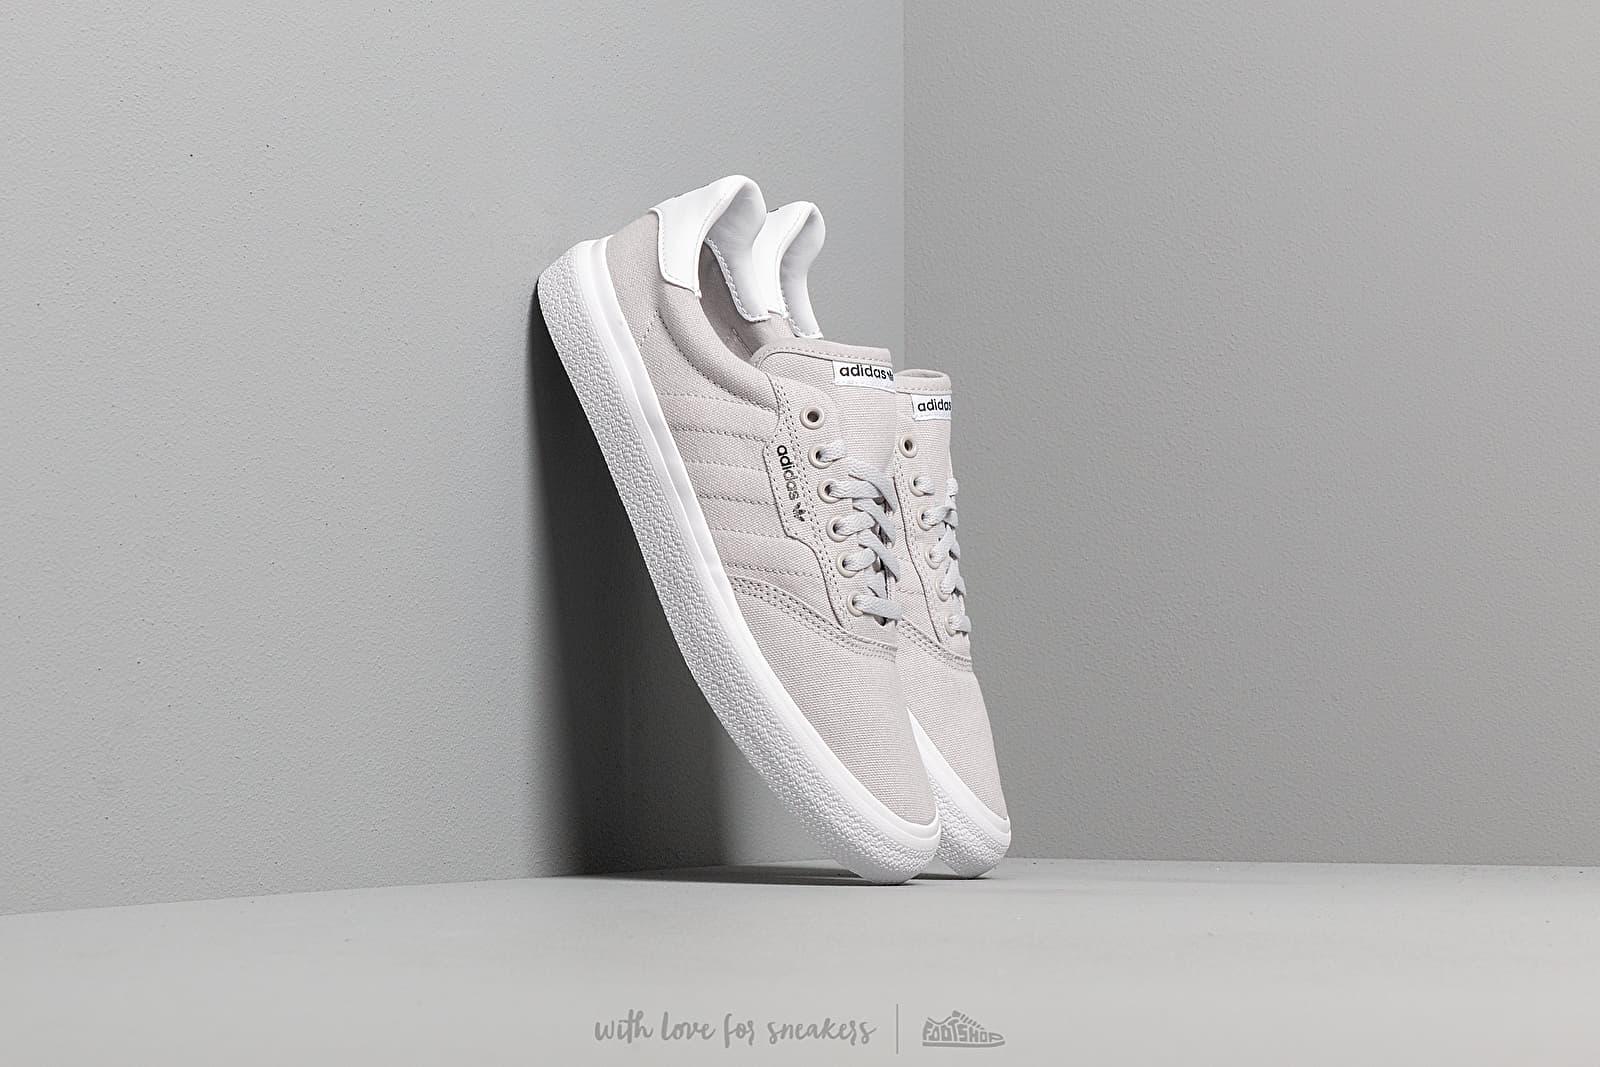 Pánské tenisky a boty adidas 3MC Light Solid Grey/ Light Solid Grey/ Ftw White